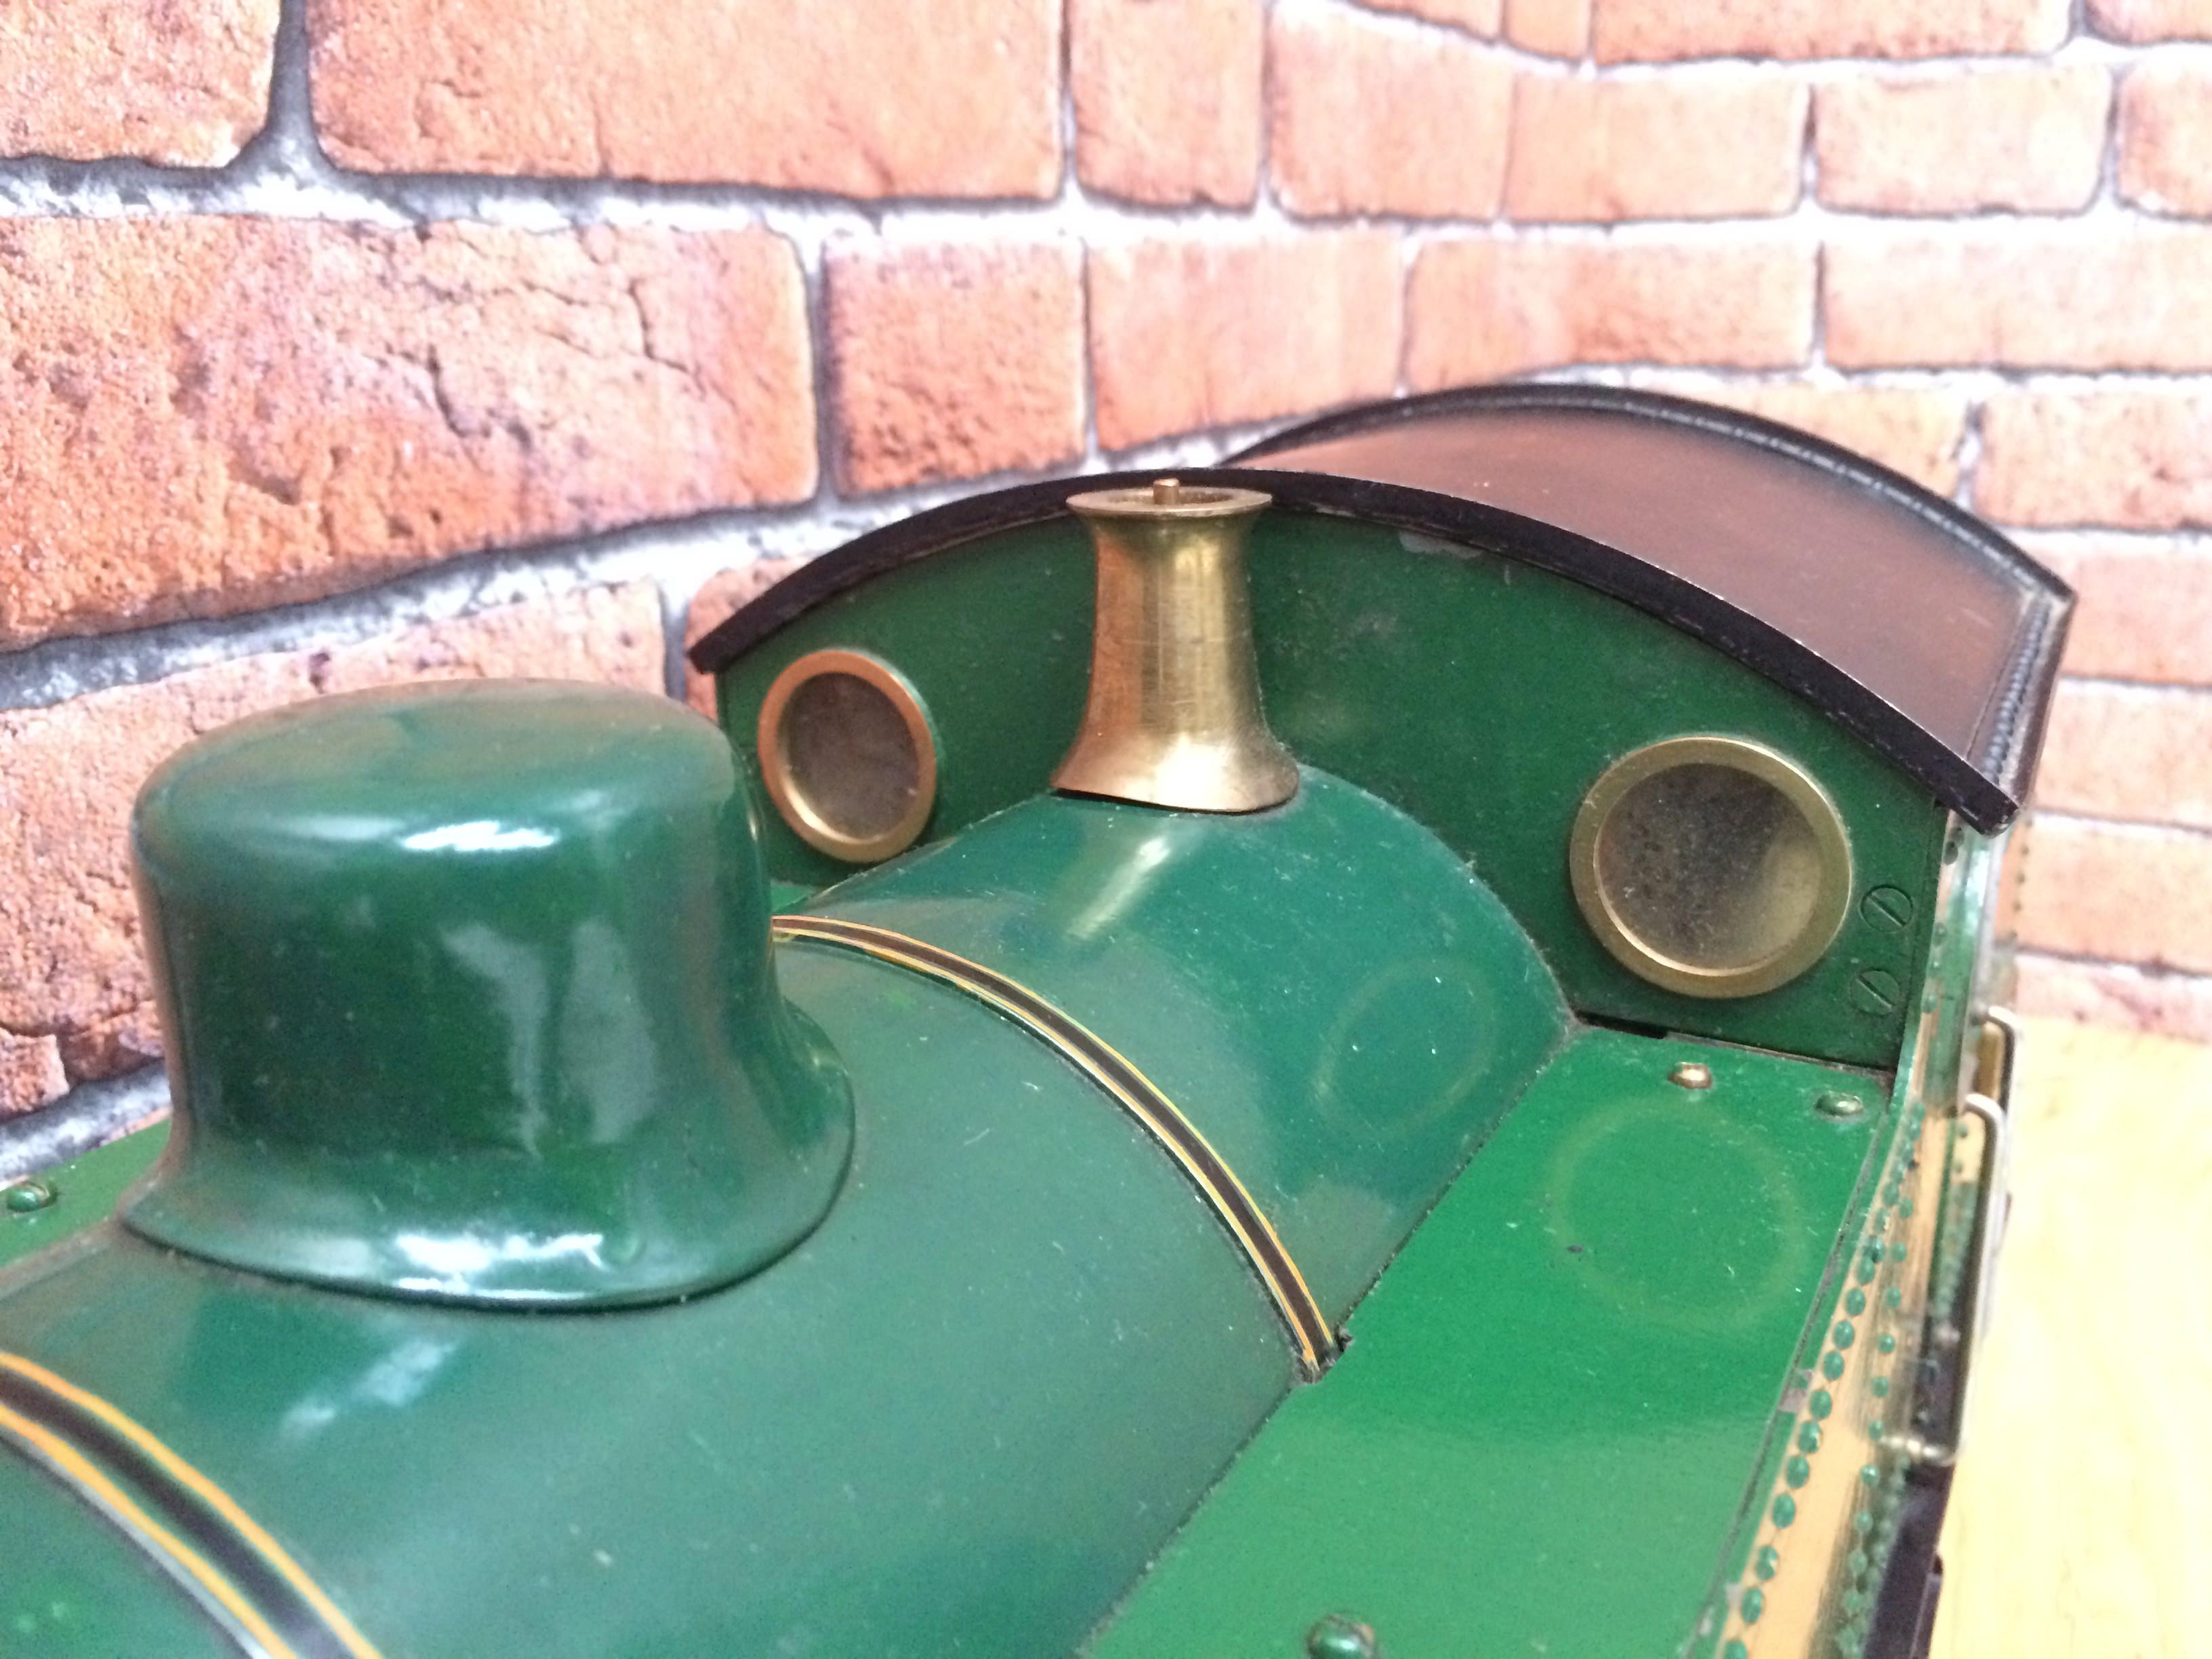 test 3 inch gauge freelance live steam tank engine for sale 07